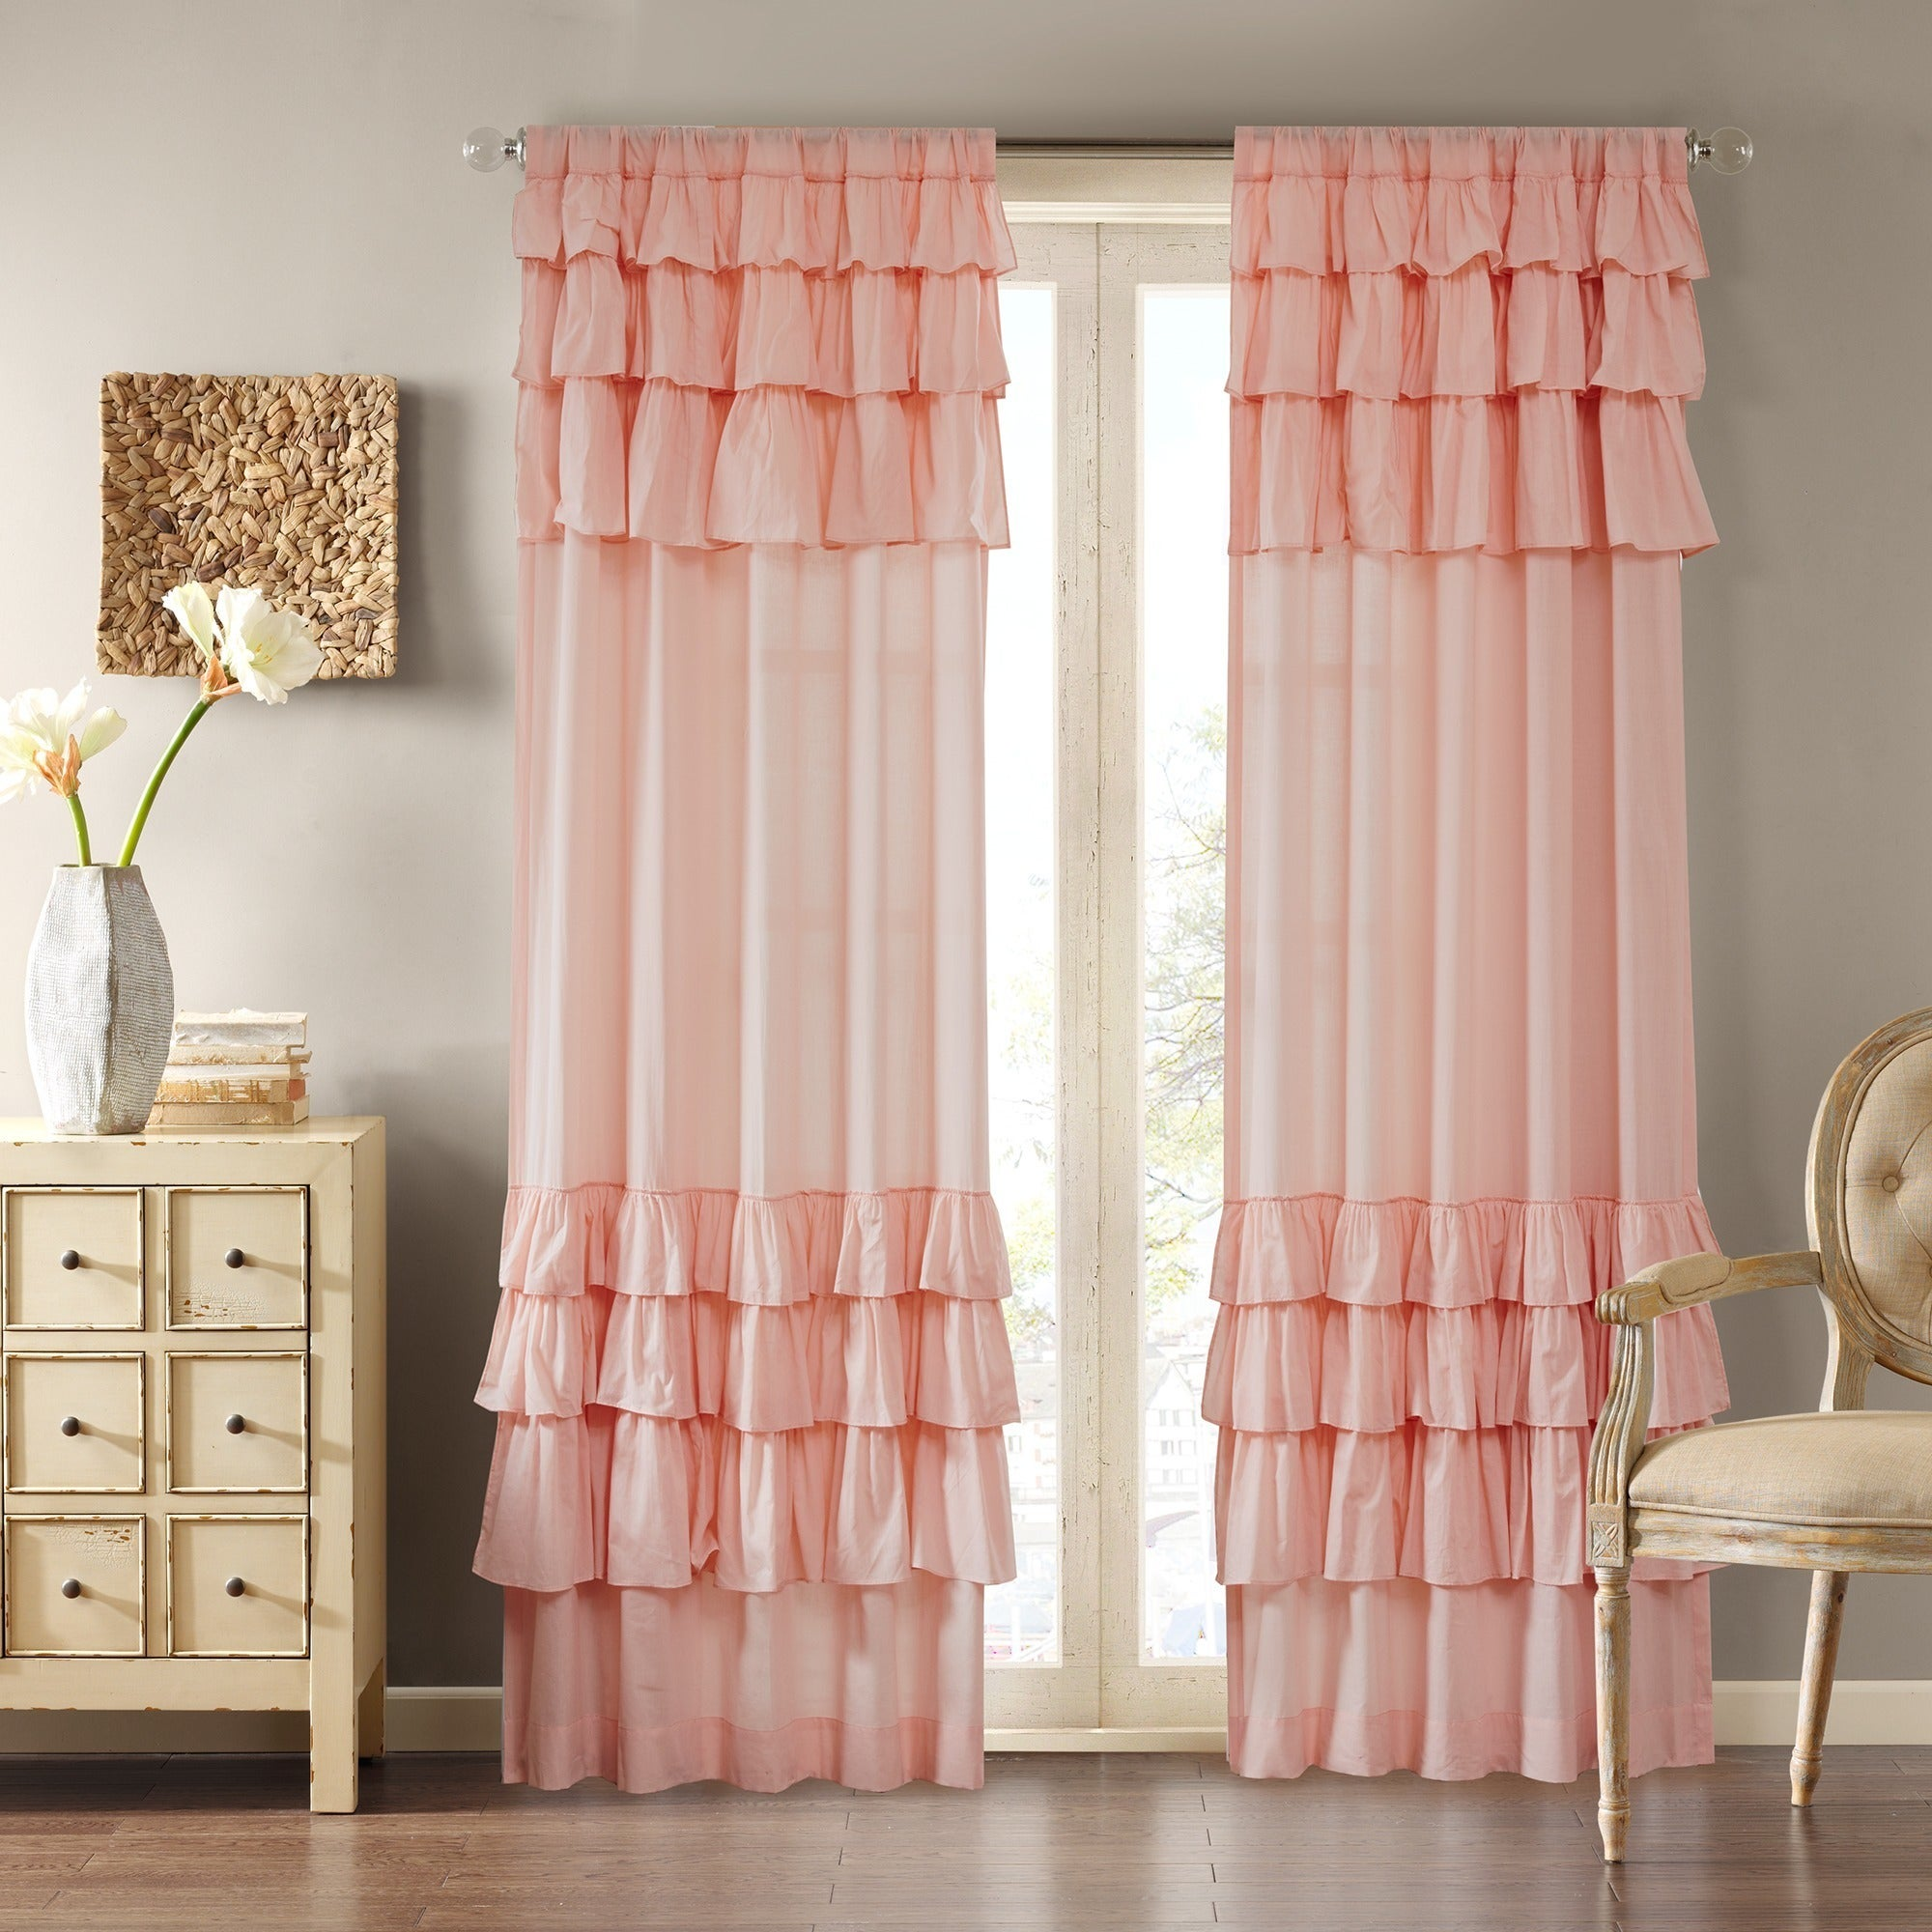 ruffle curtains flounced curtain white curtainworks panel com pnl